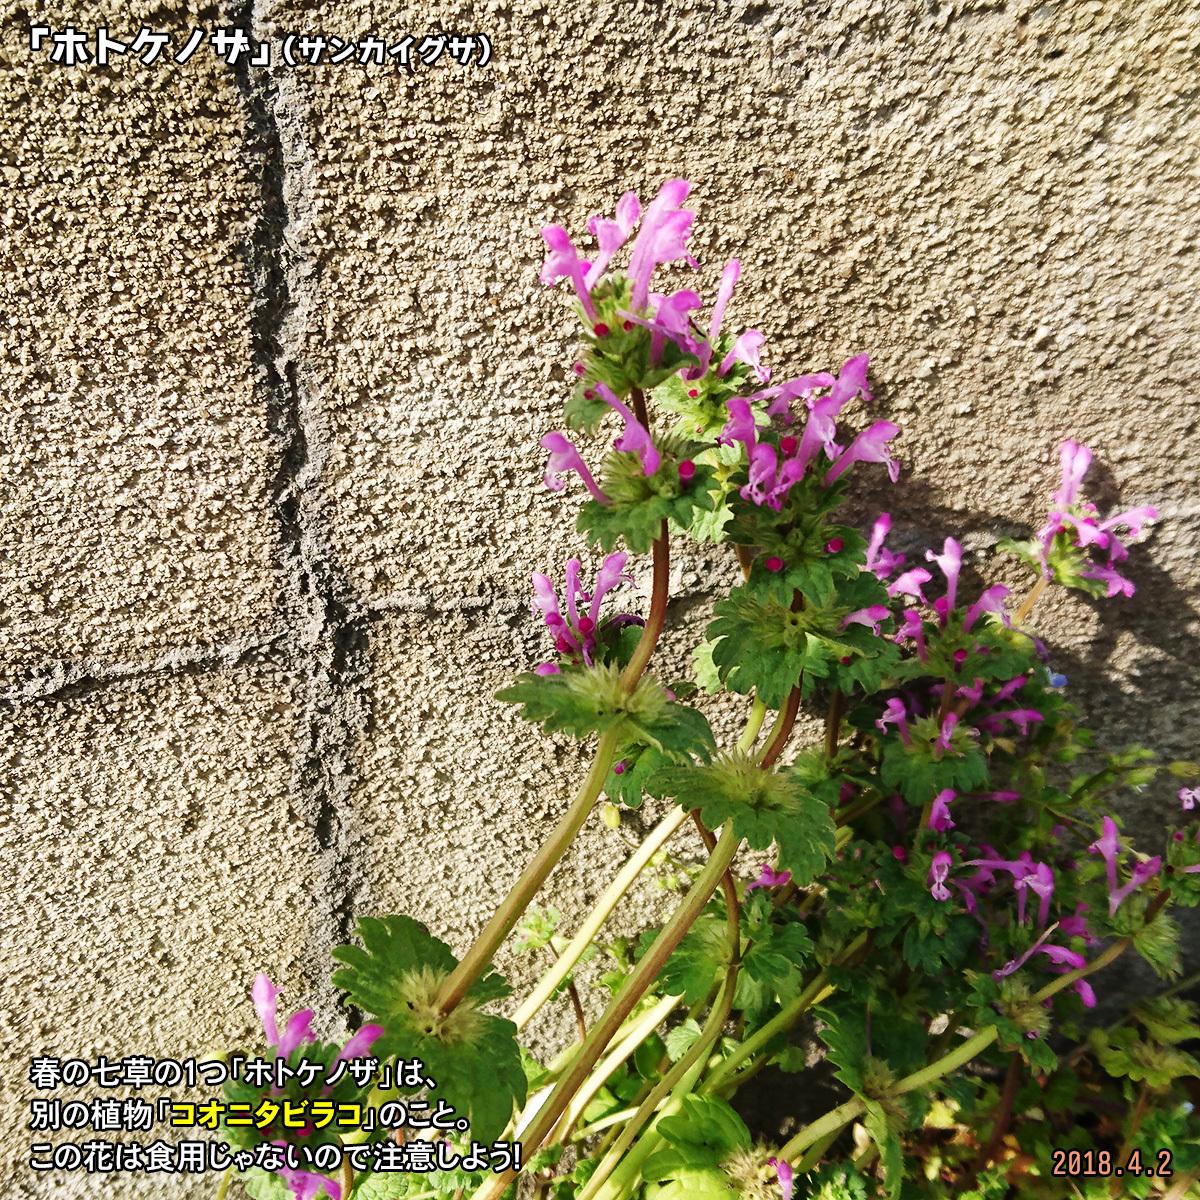 DSC_6735_20180812201630693.jpg